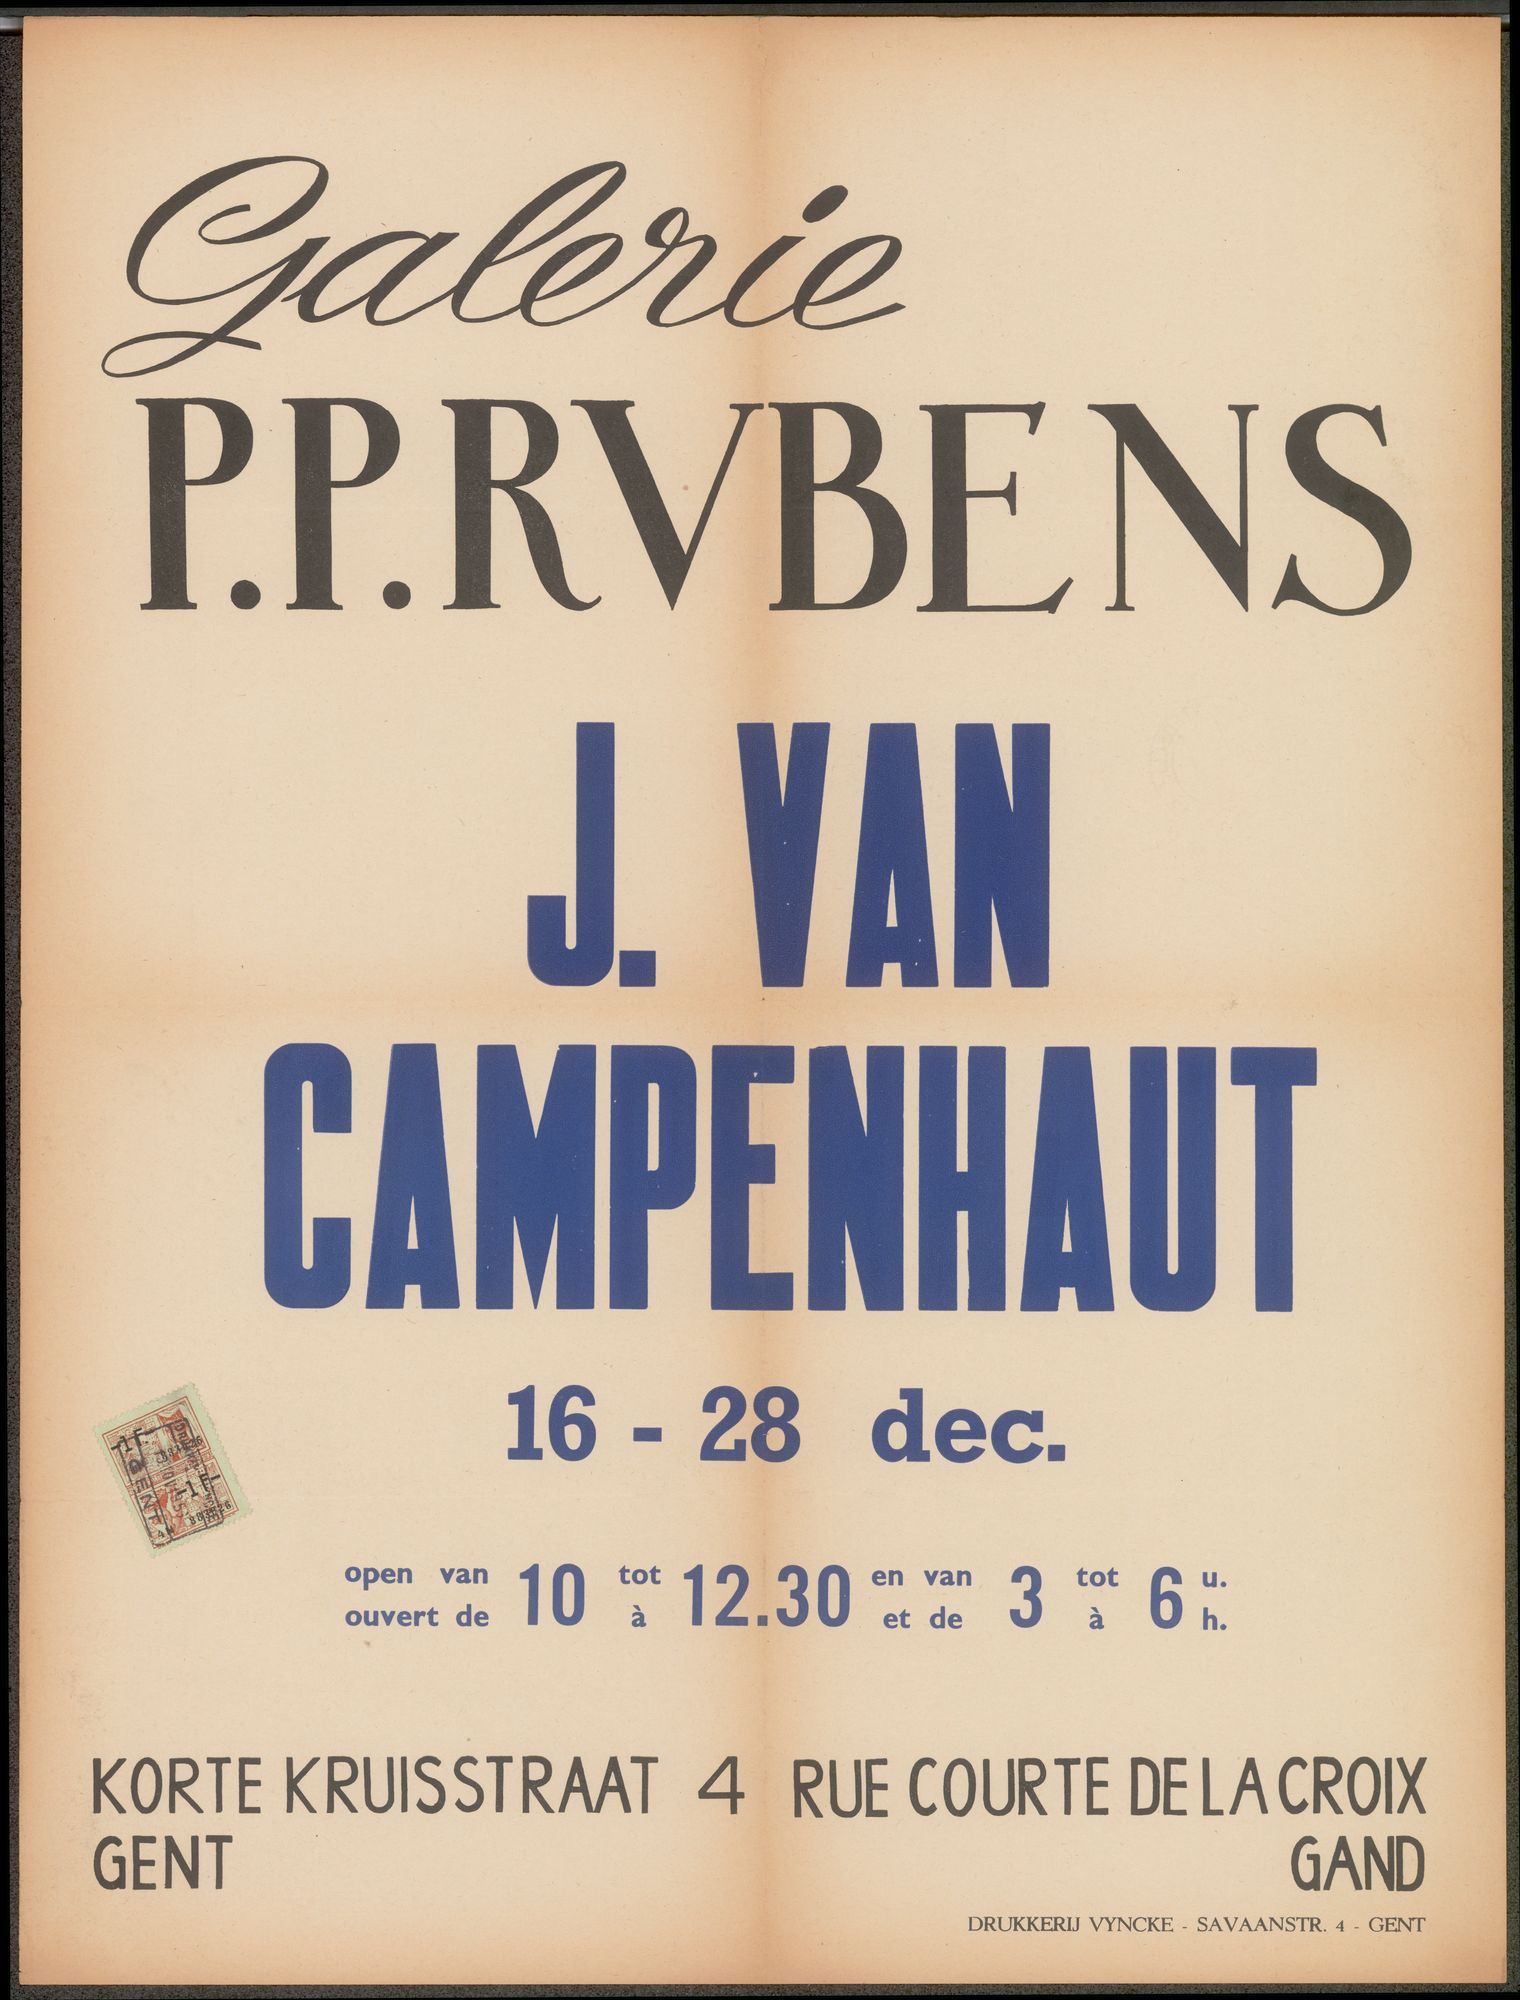 Tentoonstelling J. van Campenhaut, Galerie P.P. Rubens, Korte Kruisstraat 4 Gent, 16 december - 28 december 1956